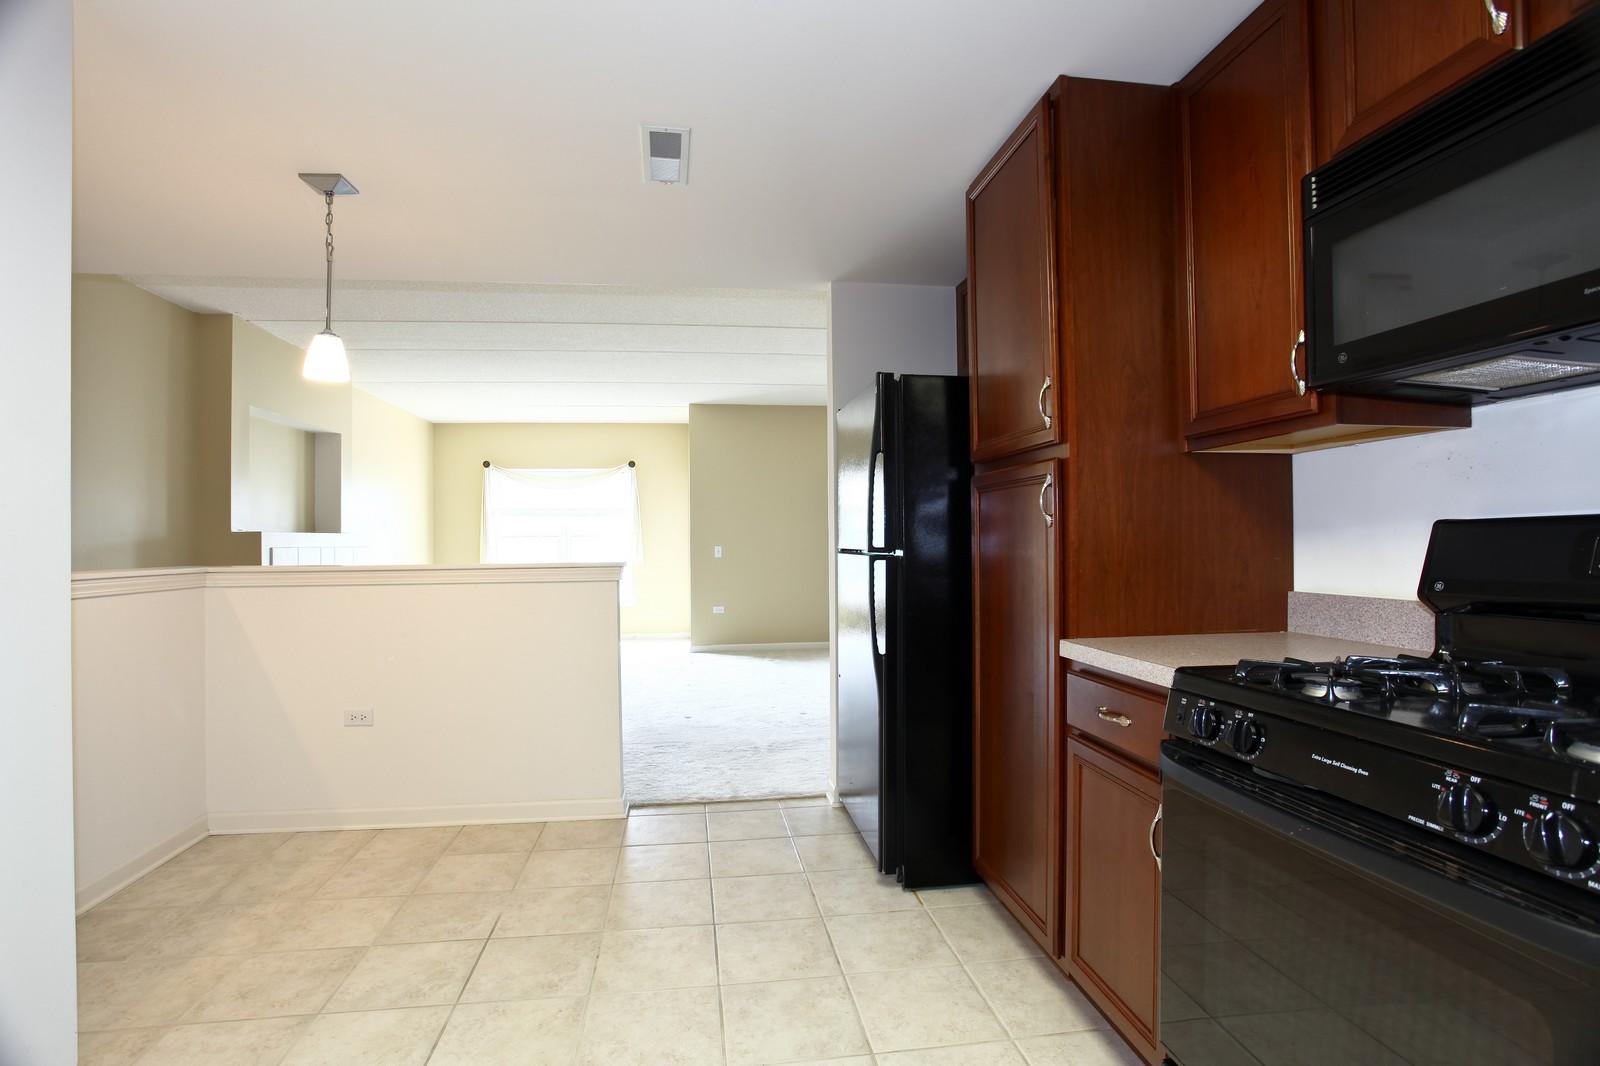 Real Estate Photography - 570 Crescent Blvd., 301, Glen Ellyn, IL, 60137 - Kitchen / Breakfast Room